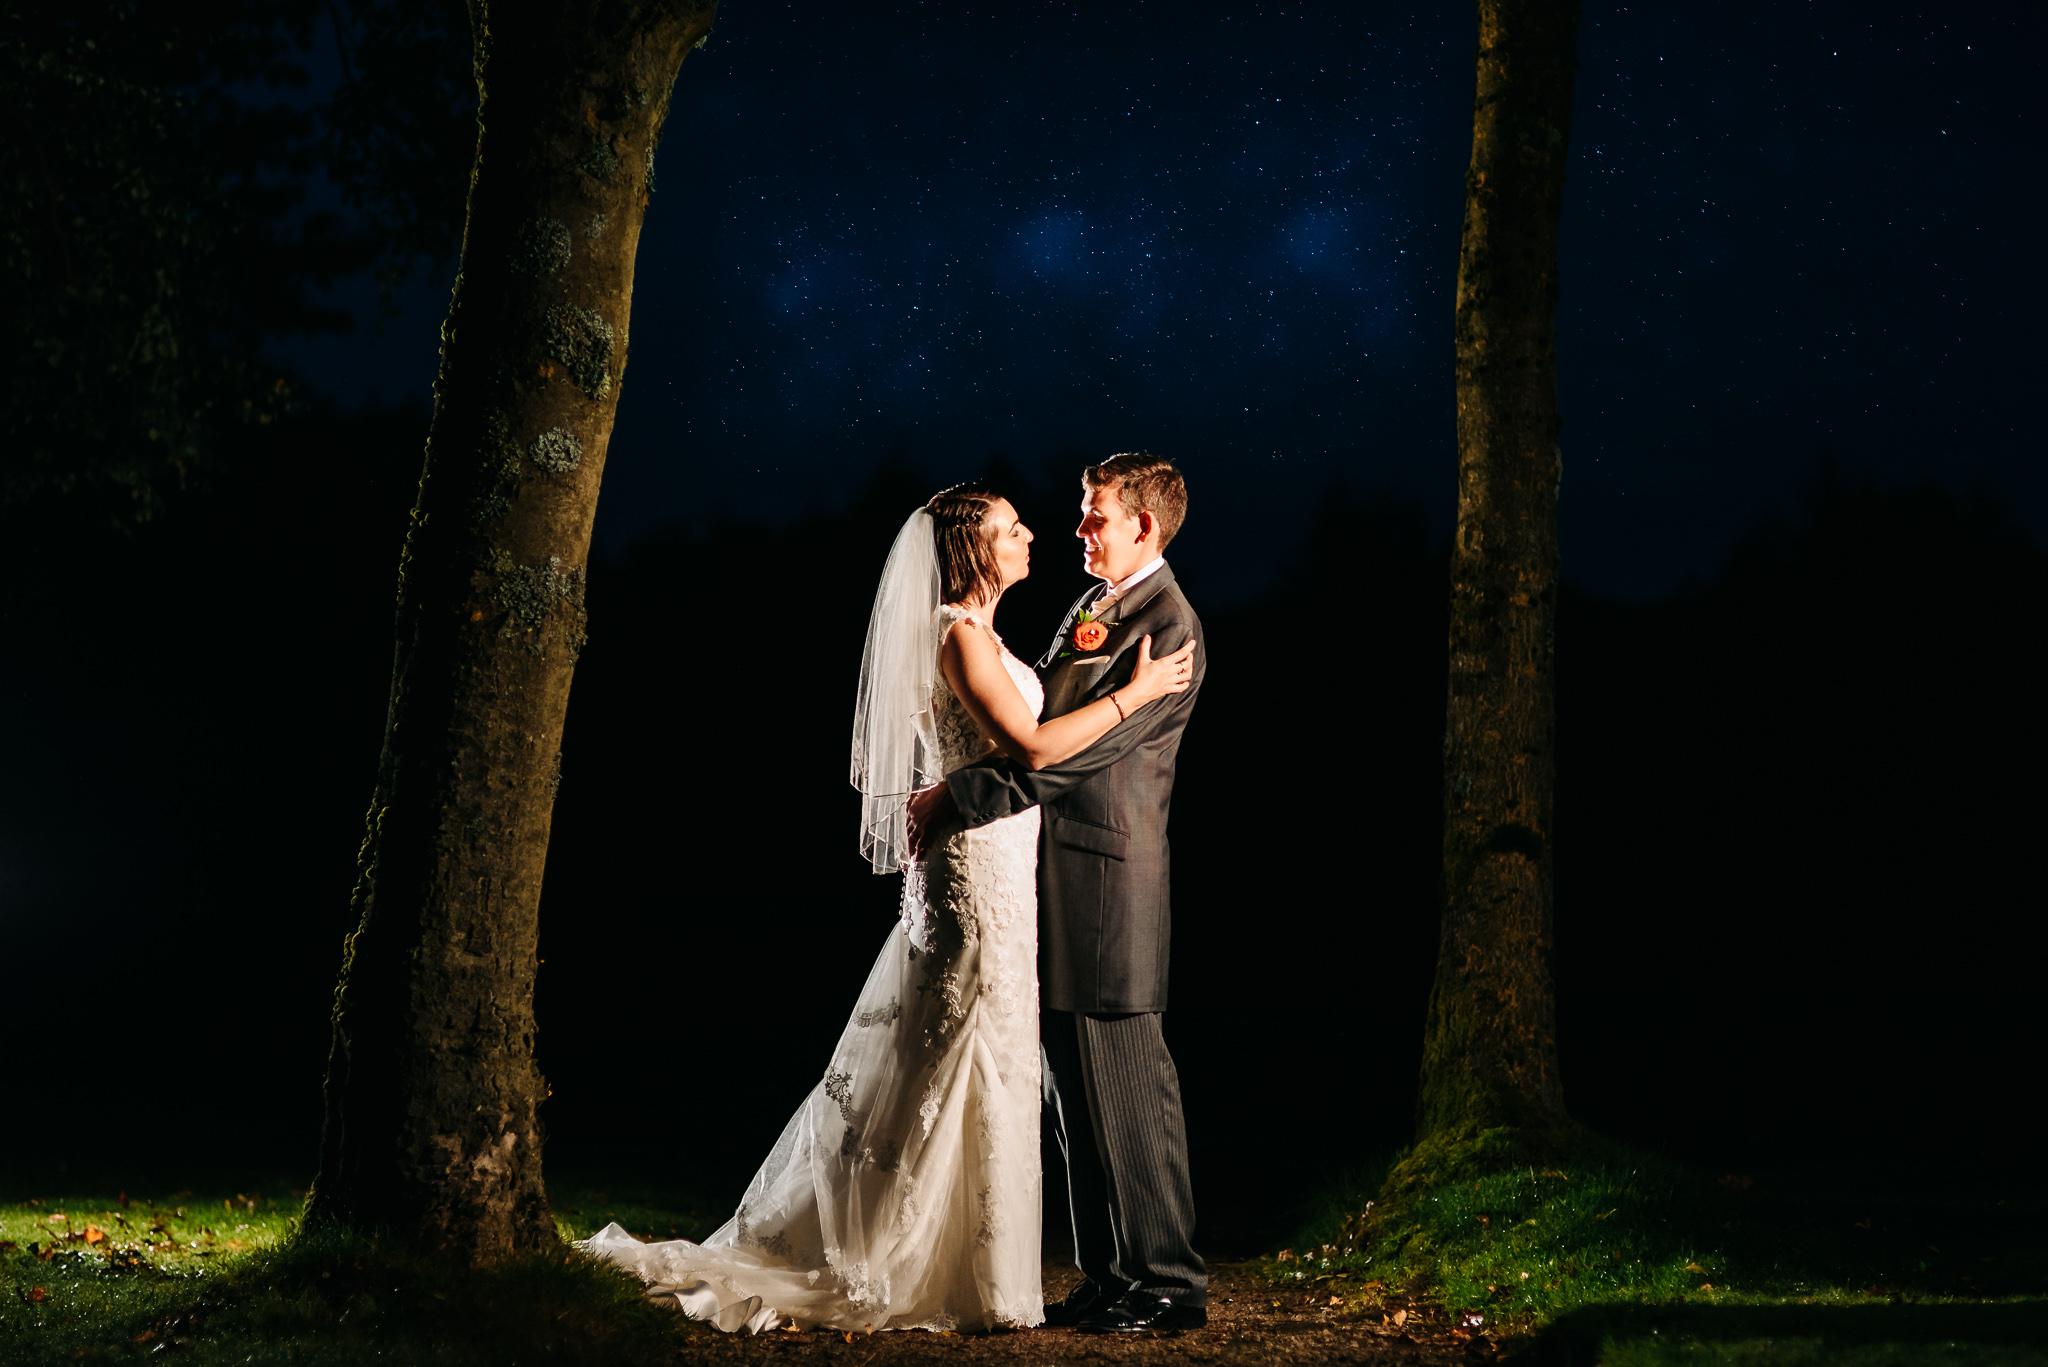 Best Of Yorkshire Wedding Photography 2017 - Martyn Hand-13.jpg